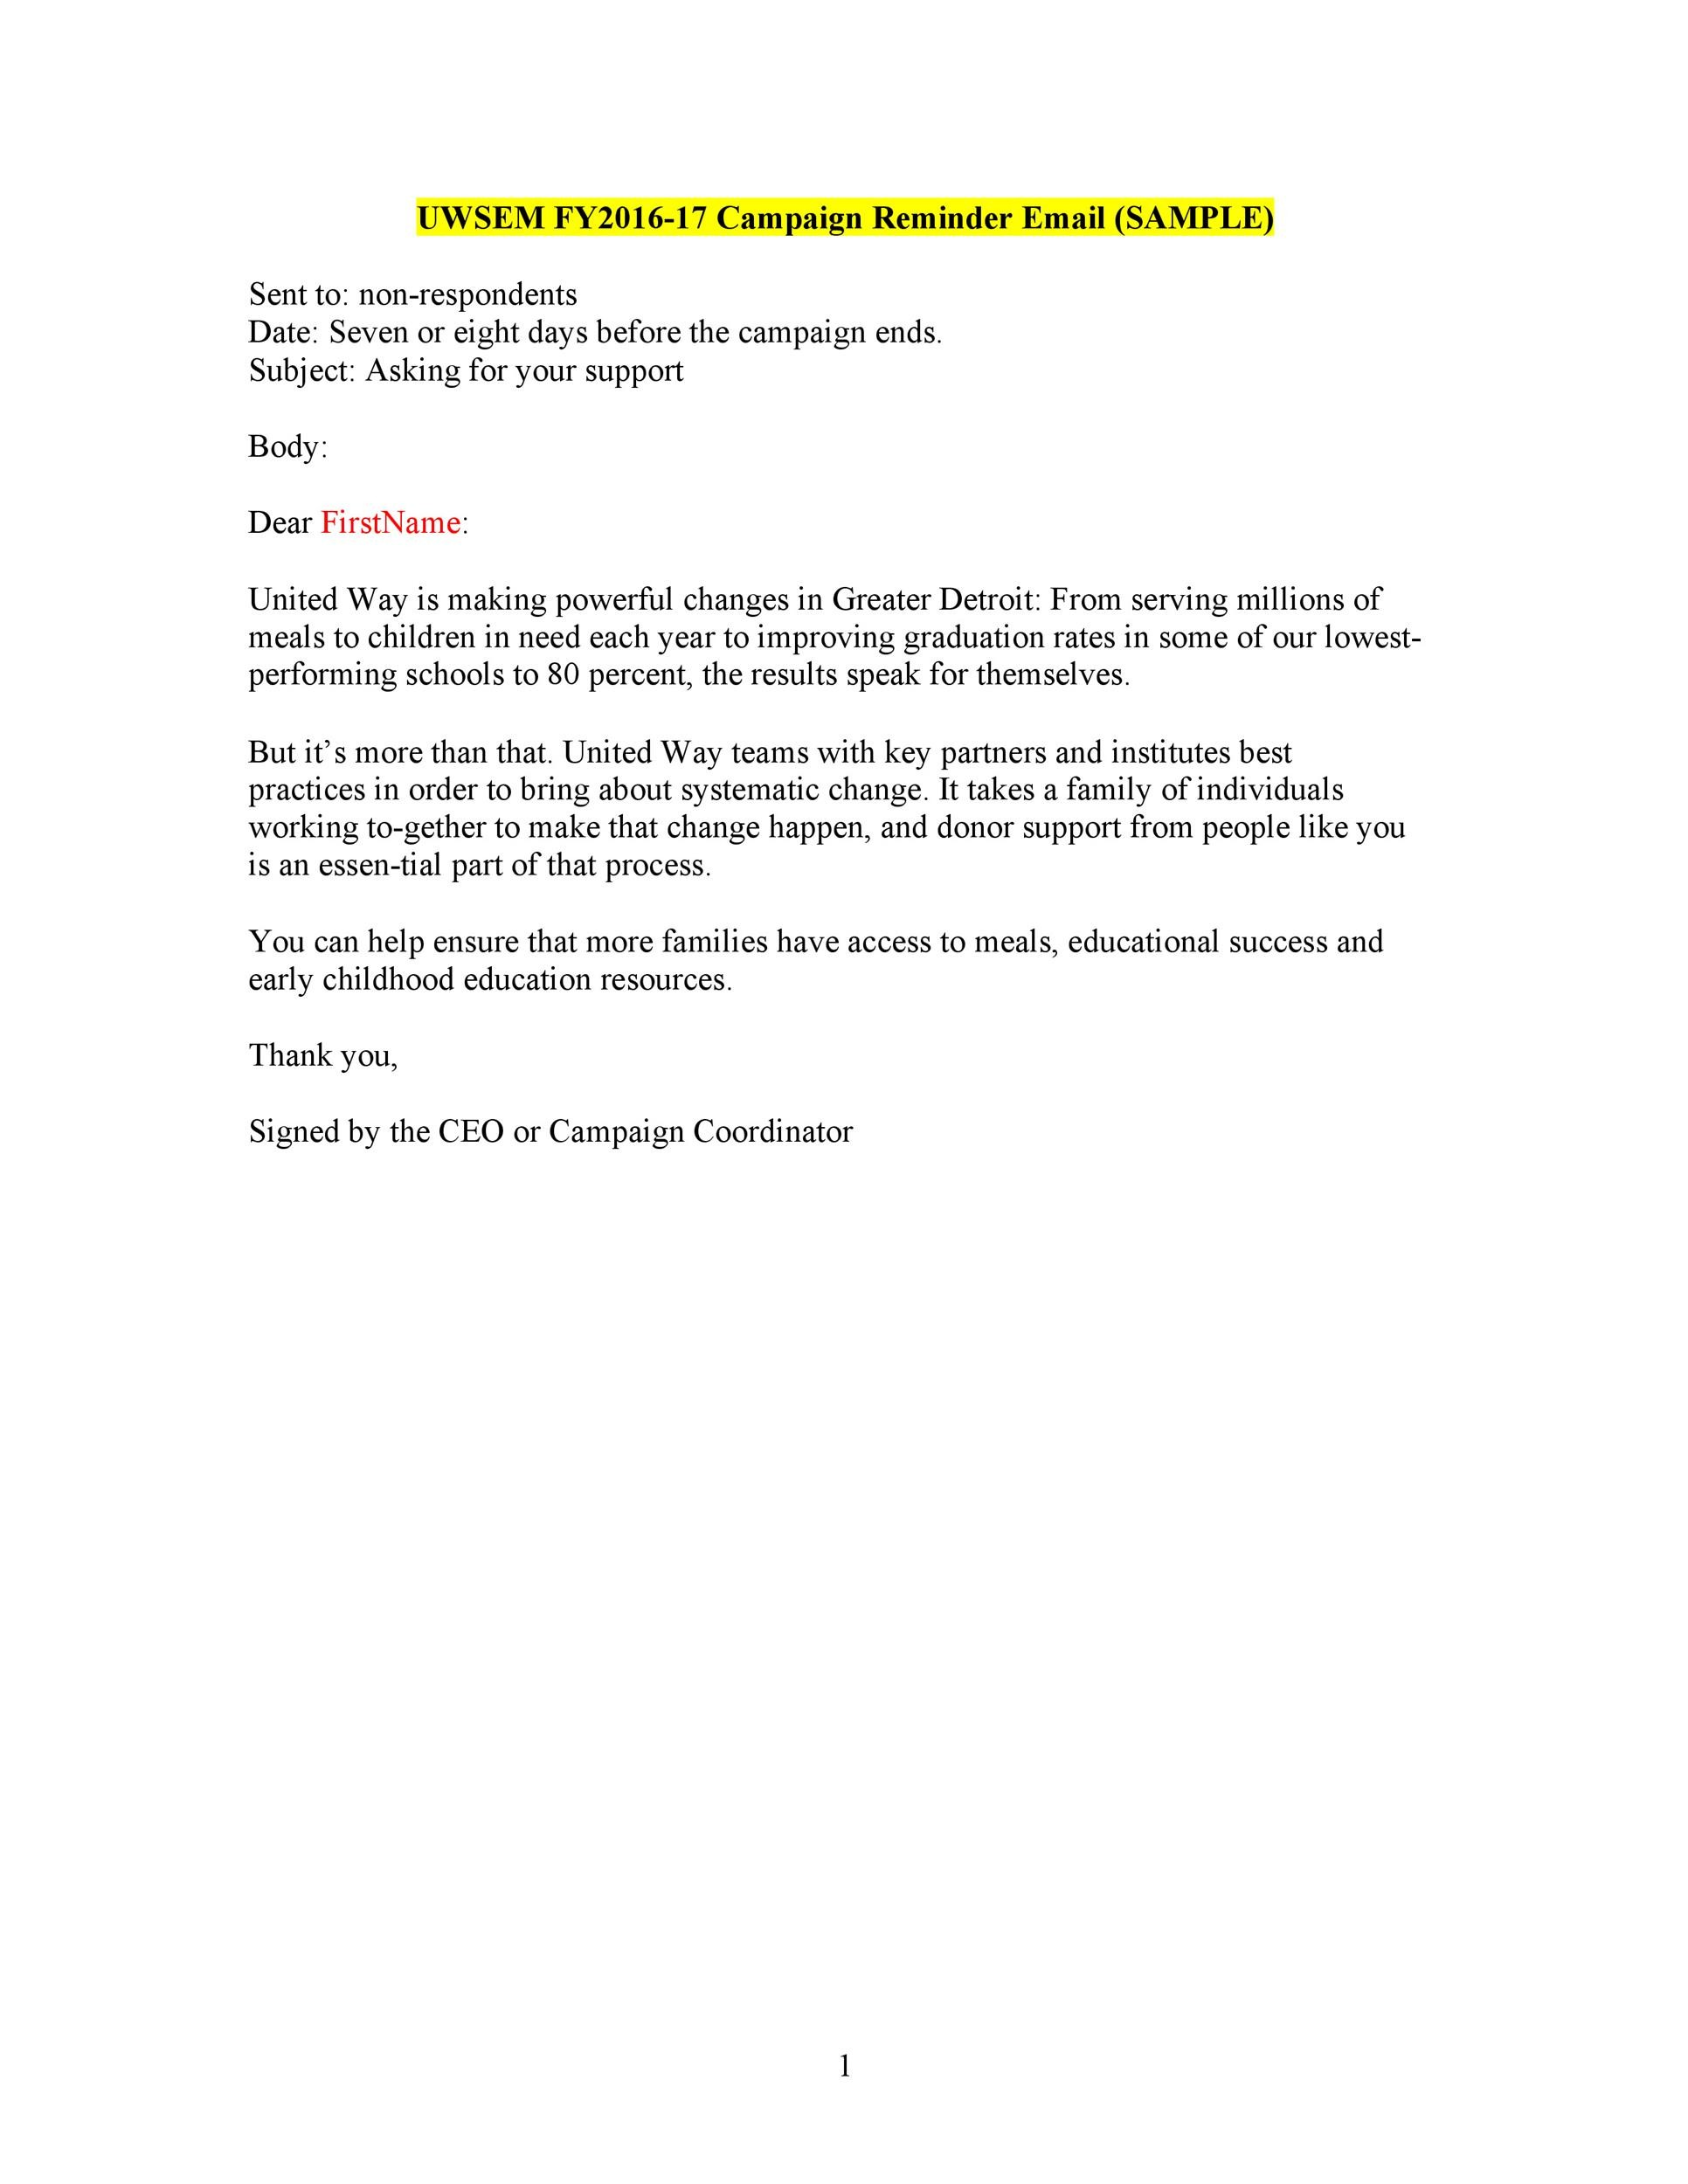 50 Polite Reminder Email Samples & Templates ᐅ Template Lab